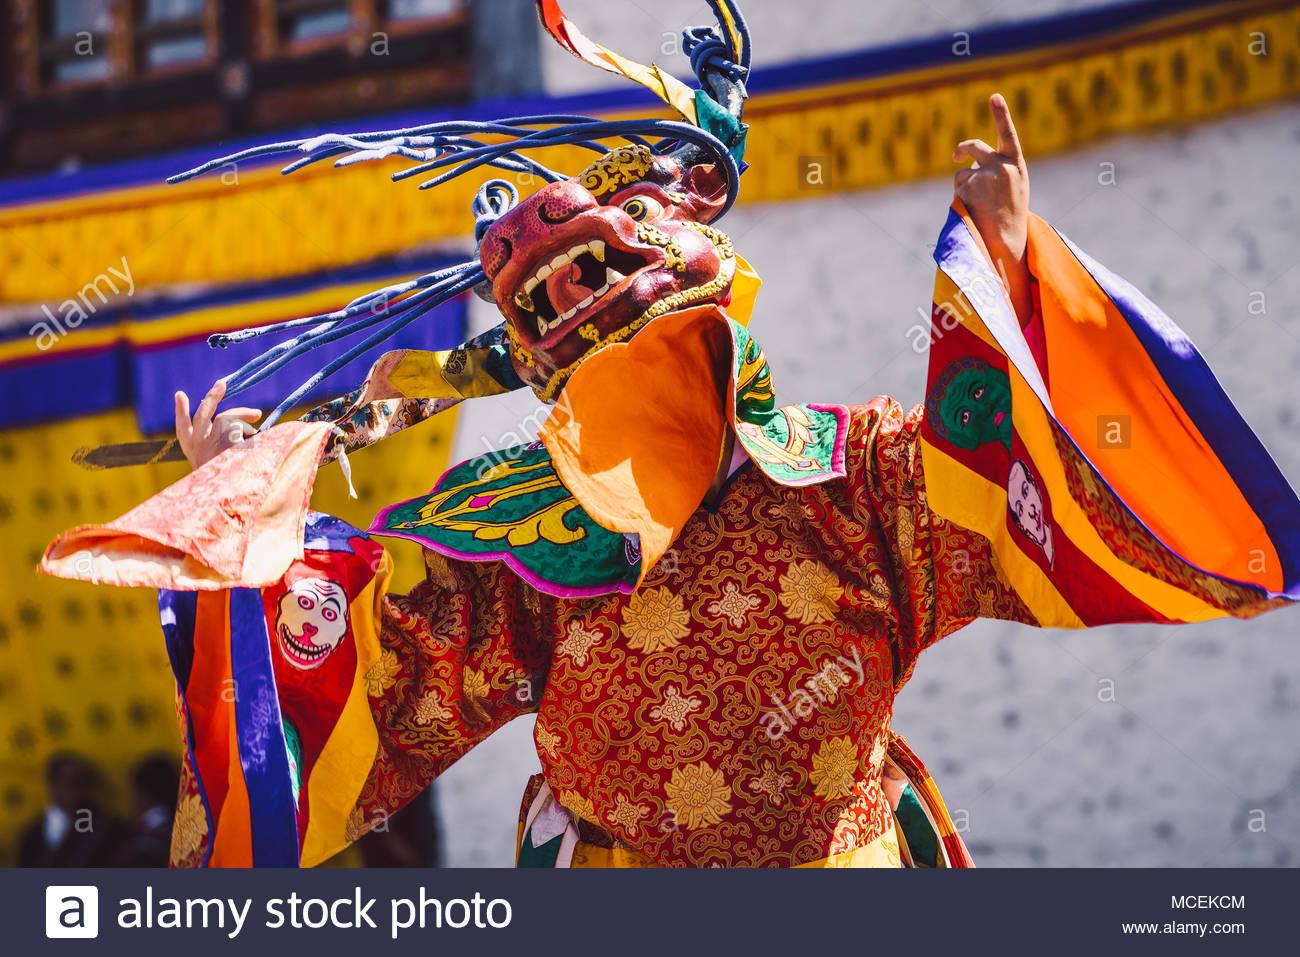 Dance of the Terrifying Deities, Gasa Festival, Bhutan. Traditional mask dance during the Paro Tshechu. - Stock Image